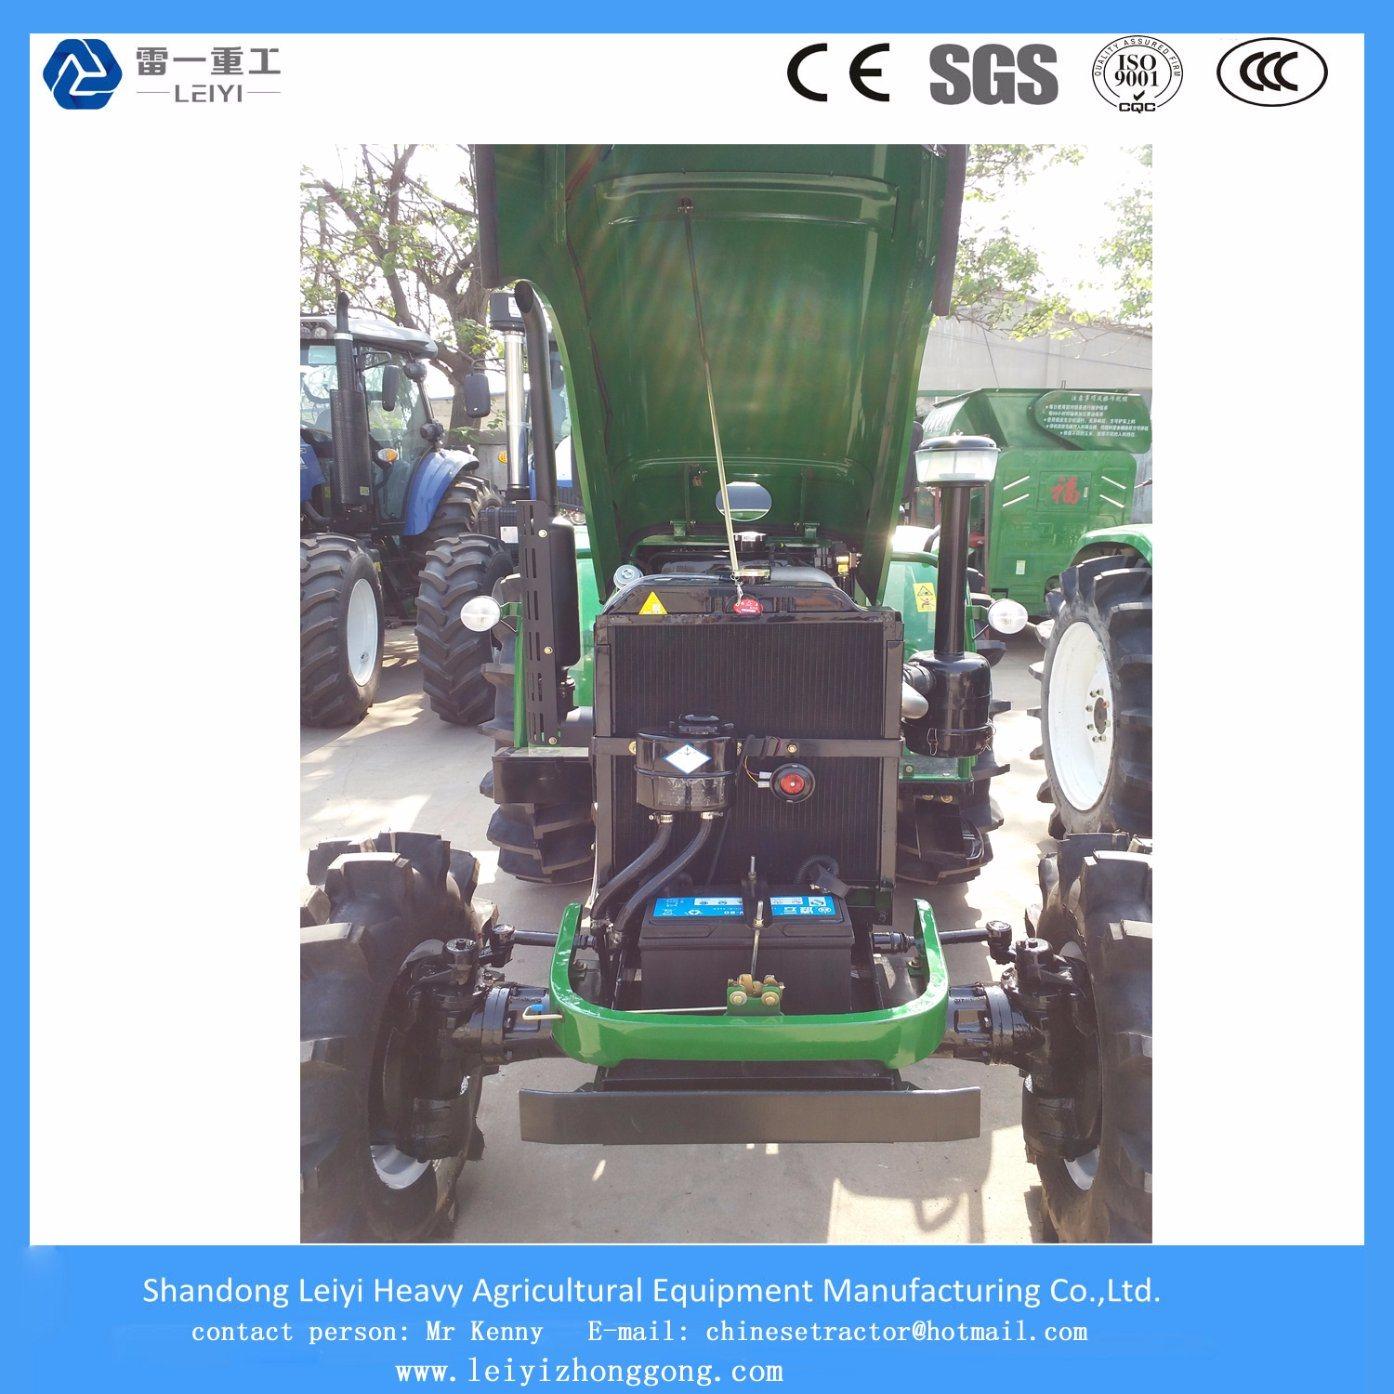 2017 New Style Medium Multifunctional Tractor 40HP/48HP/55HP